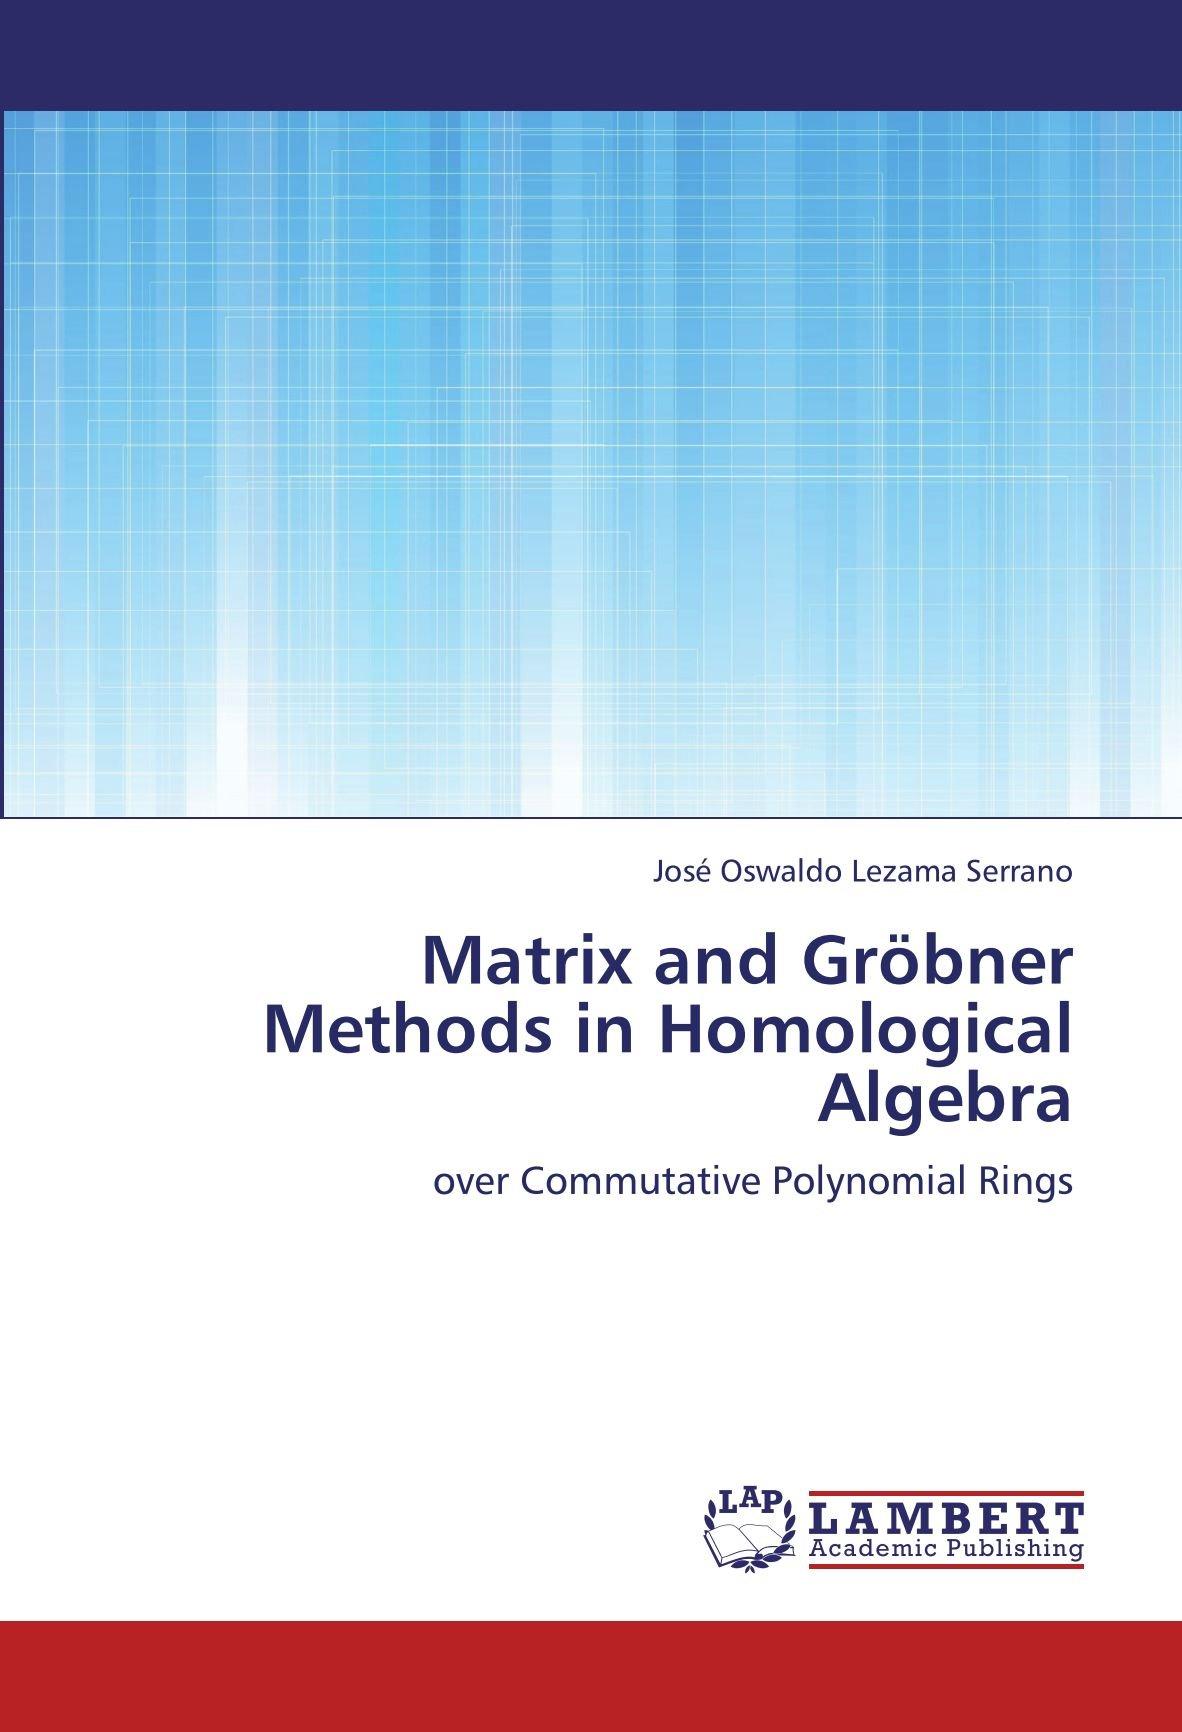 Methods of Homological Algebra